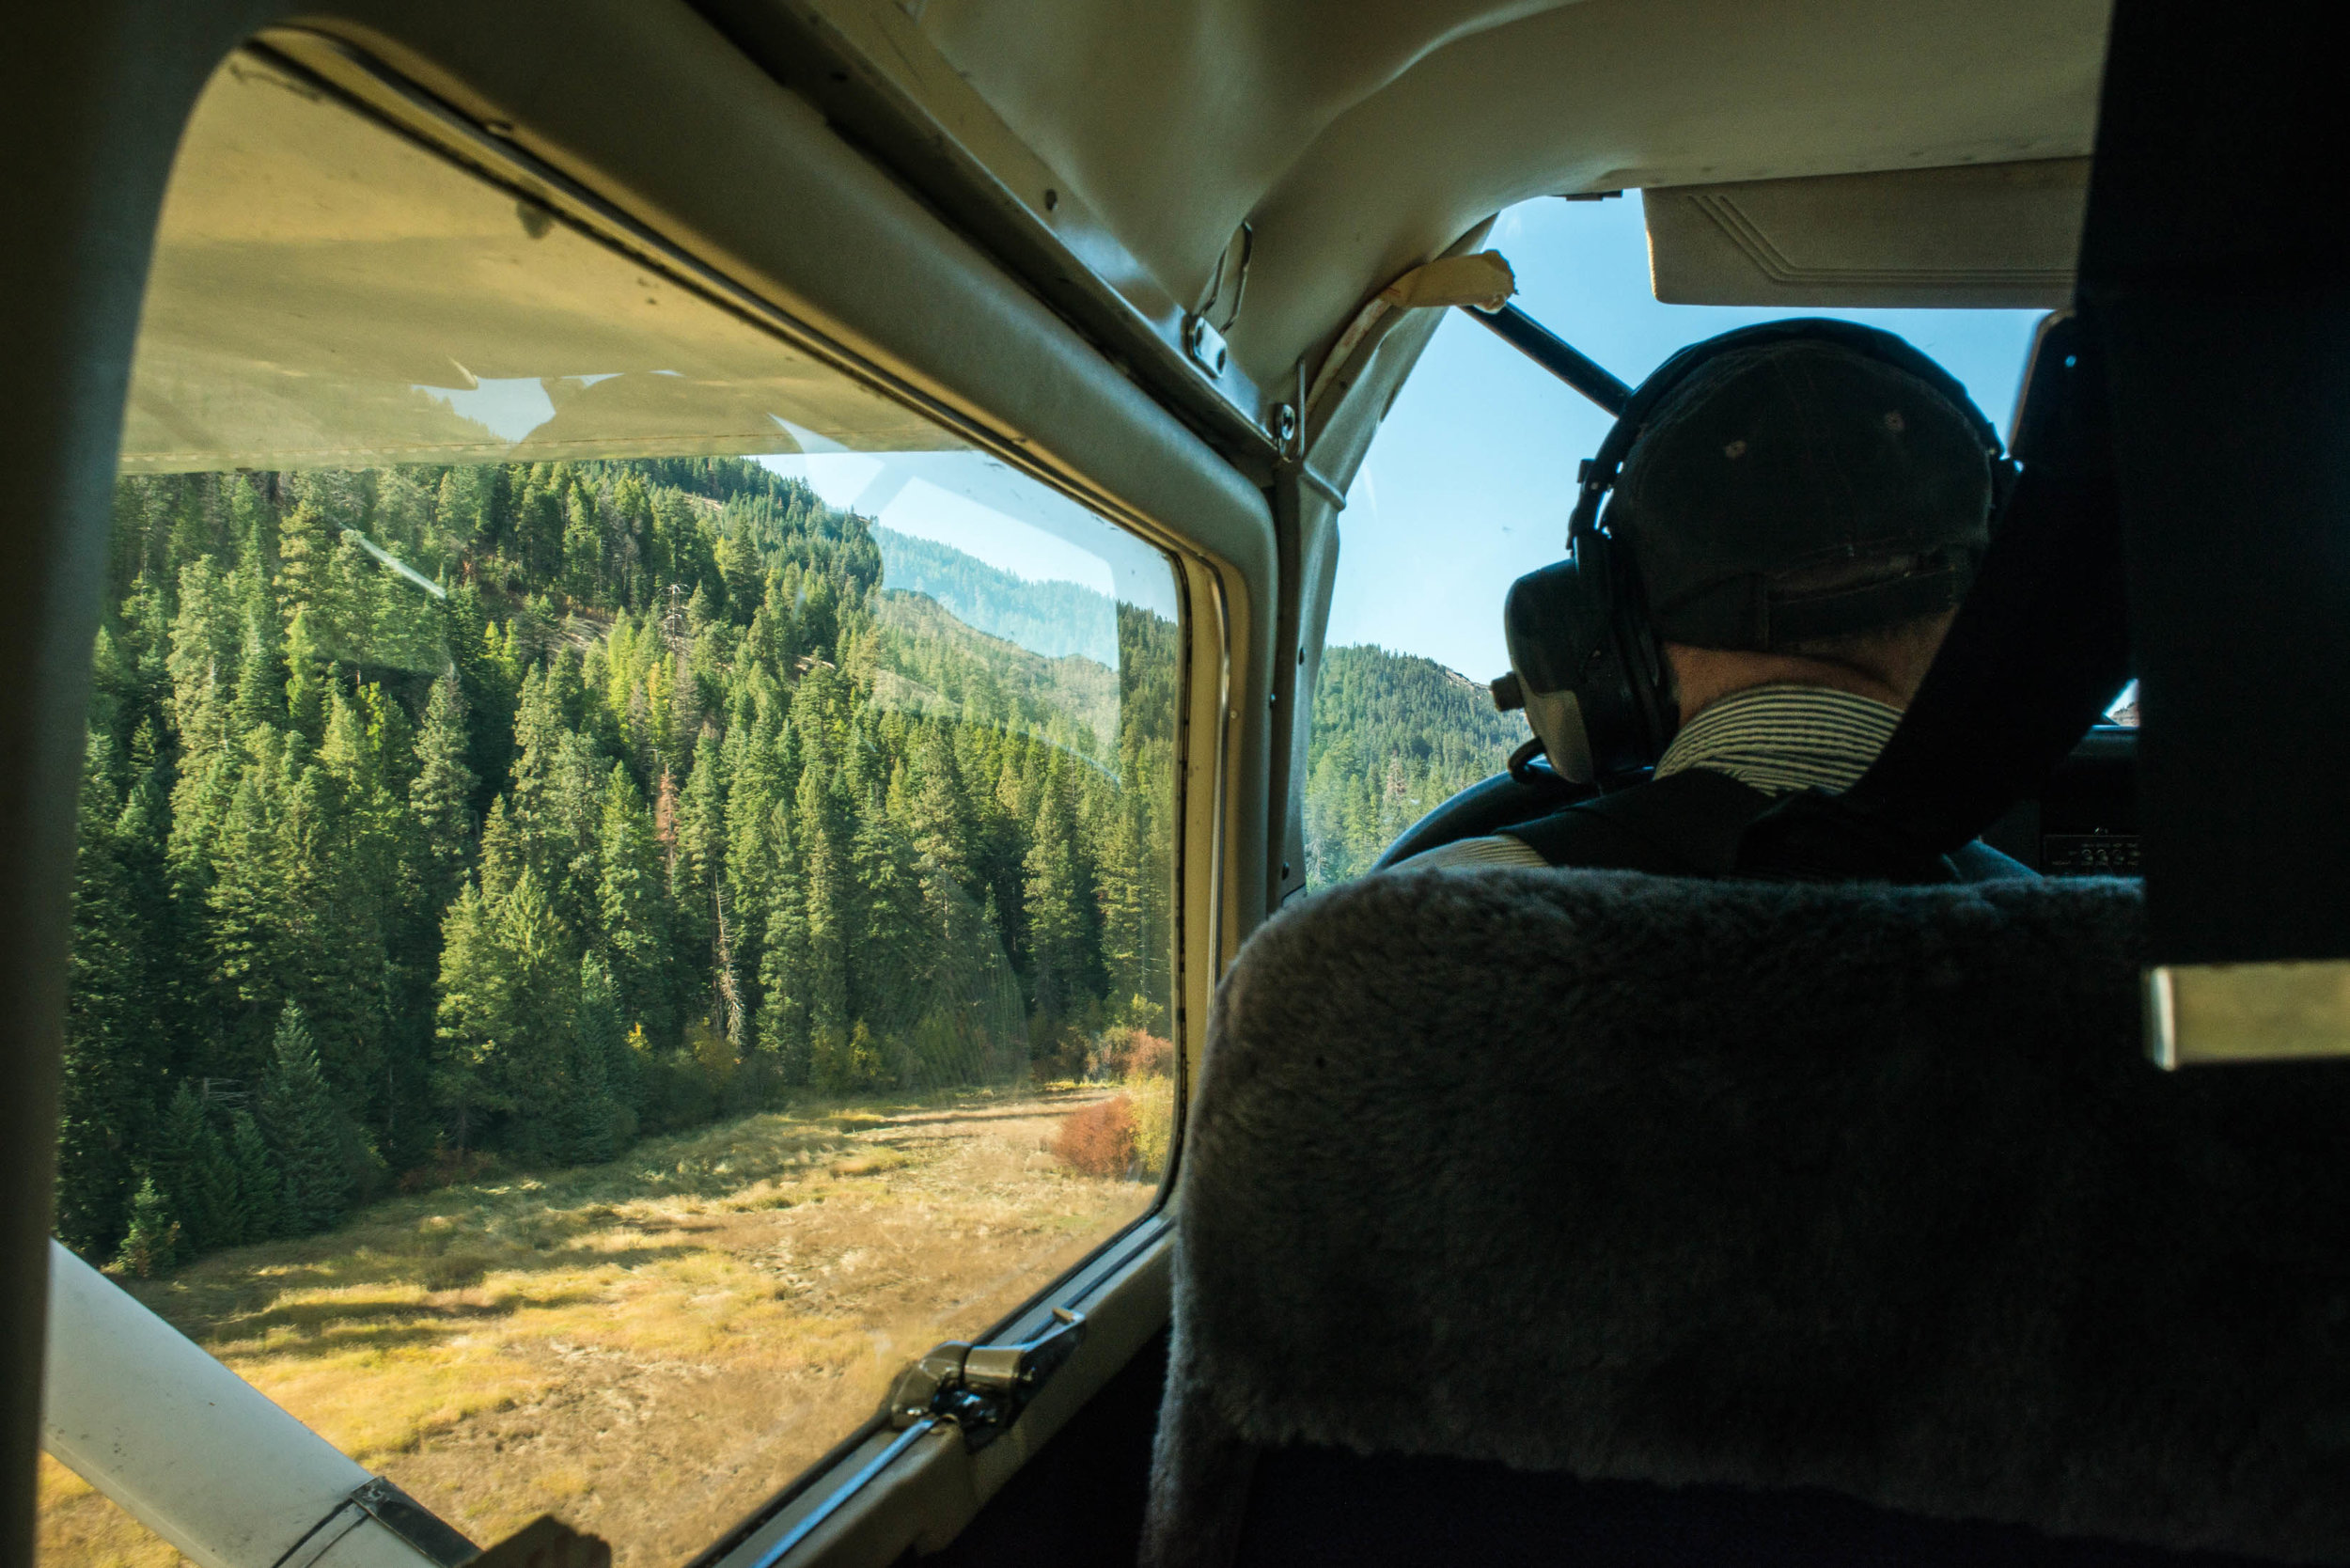 Minam_River_Lodge_Wallowa_Mountains_Eagle_Cap_Wilderness_Oregon_Autumn_2017_Please_Credit_Talia_Jean_Galvin-5.jpg